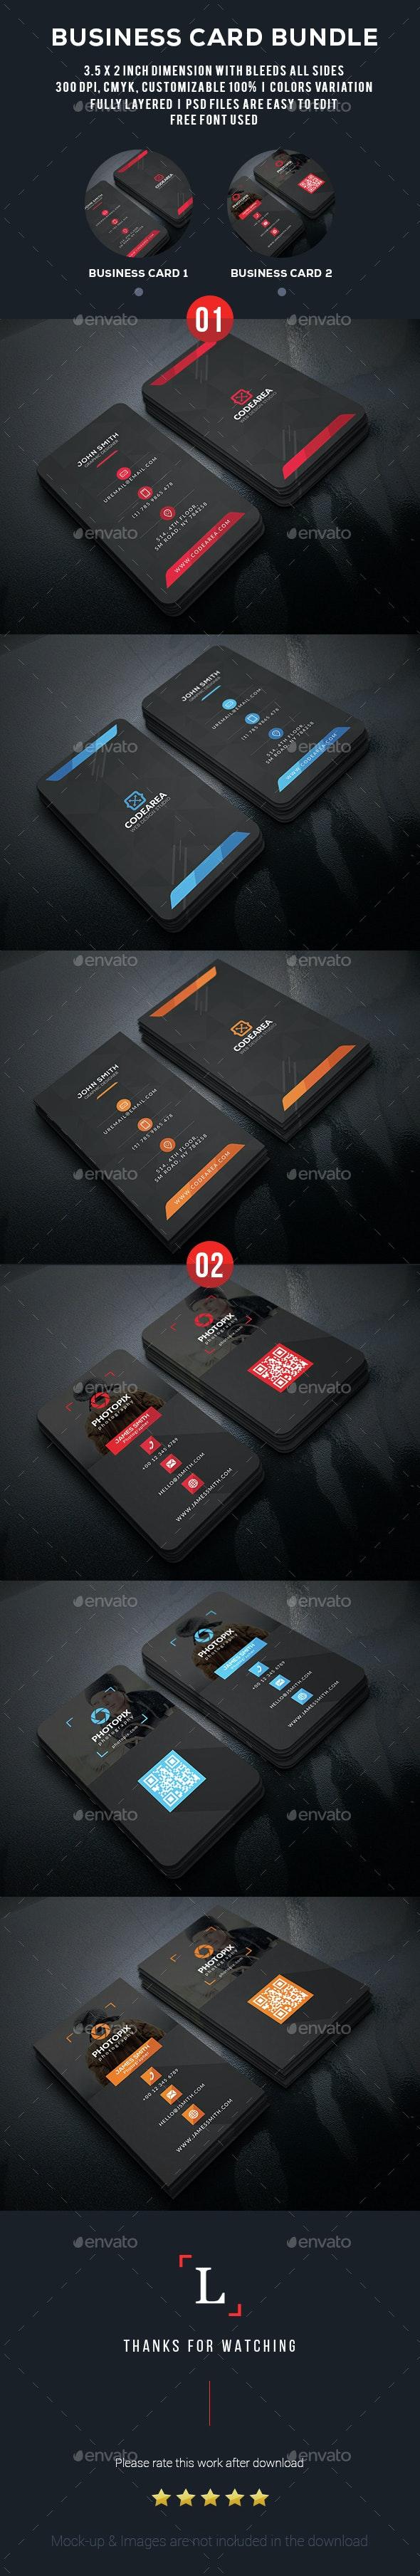 Black Business Card Bundle - Business Cards Print Templates